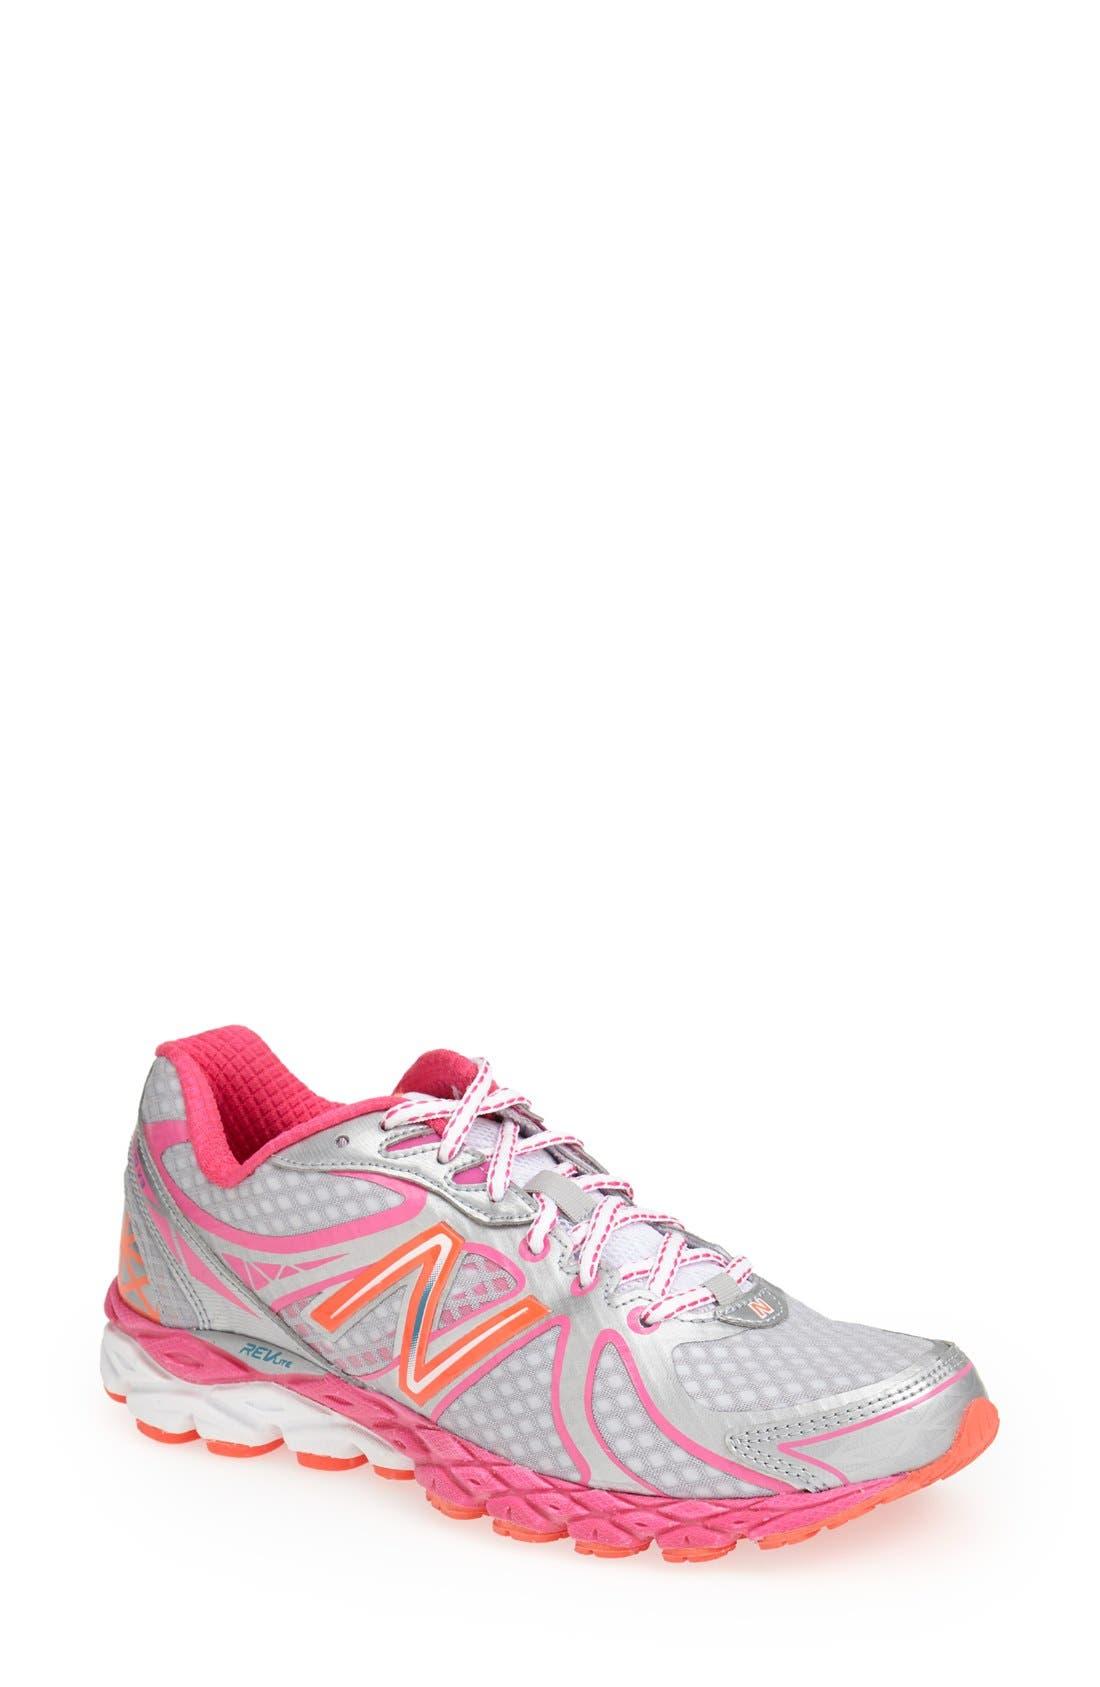 Main Image - New Balance '870' Running Shoe (Women)(Regular Retail Price: $109.95)